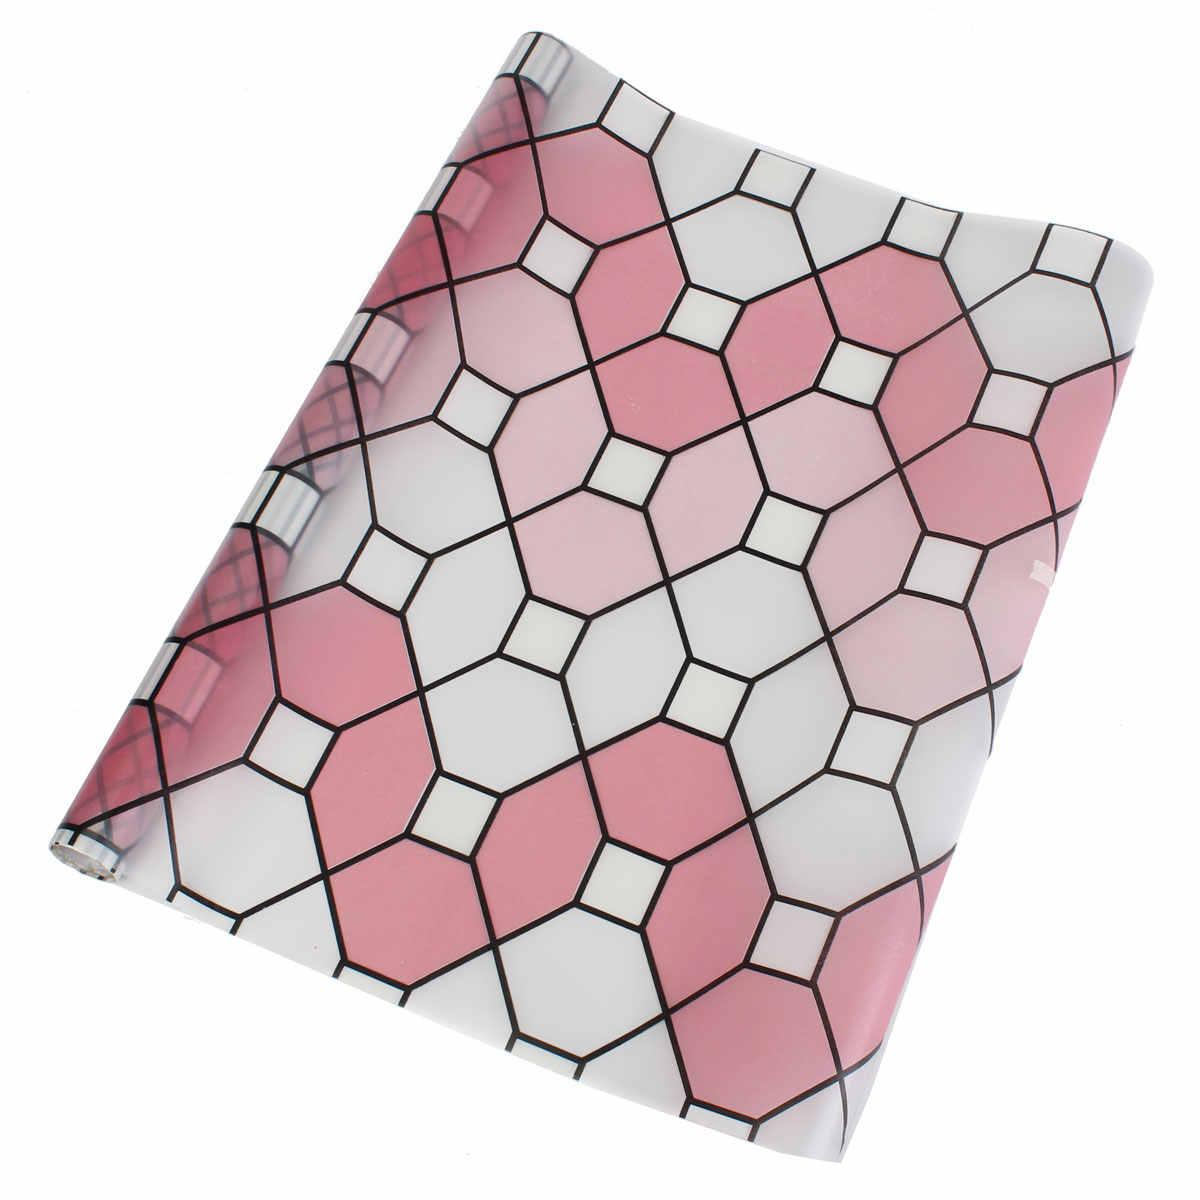 Матовый винил конфиденциальности Стекло окна Плёнки цветок Наклейки Room Decor 45 x 90cm-Geometry